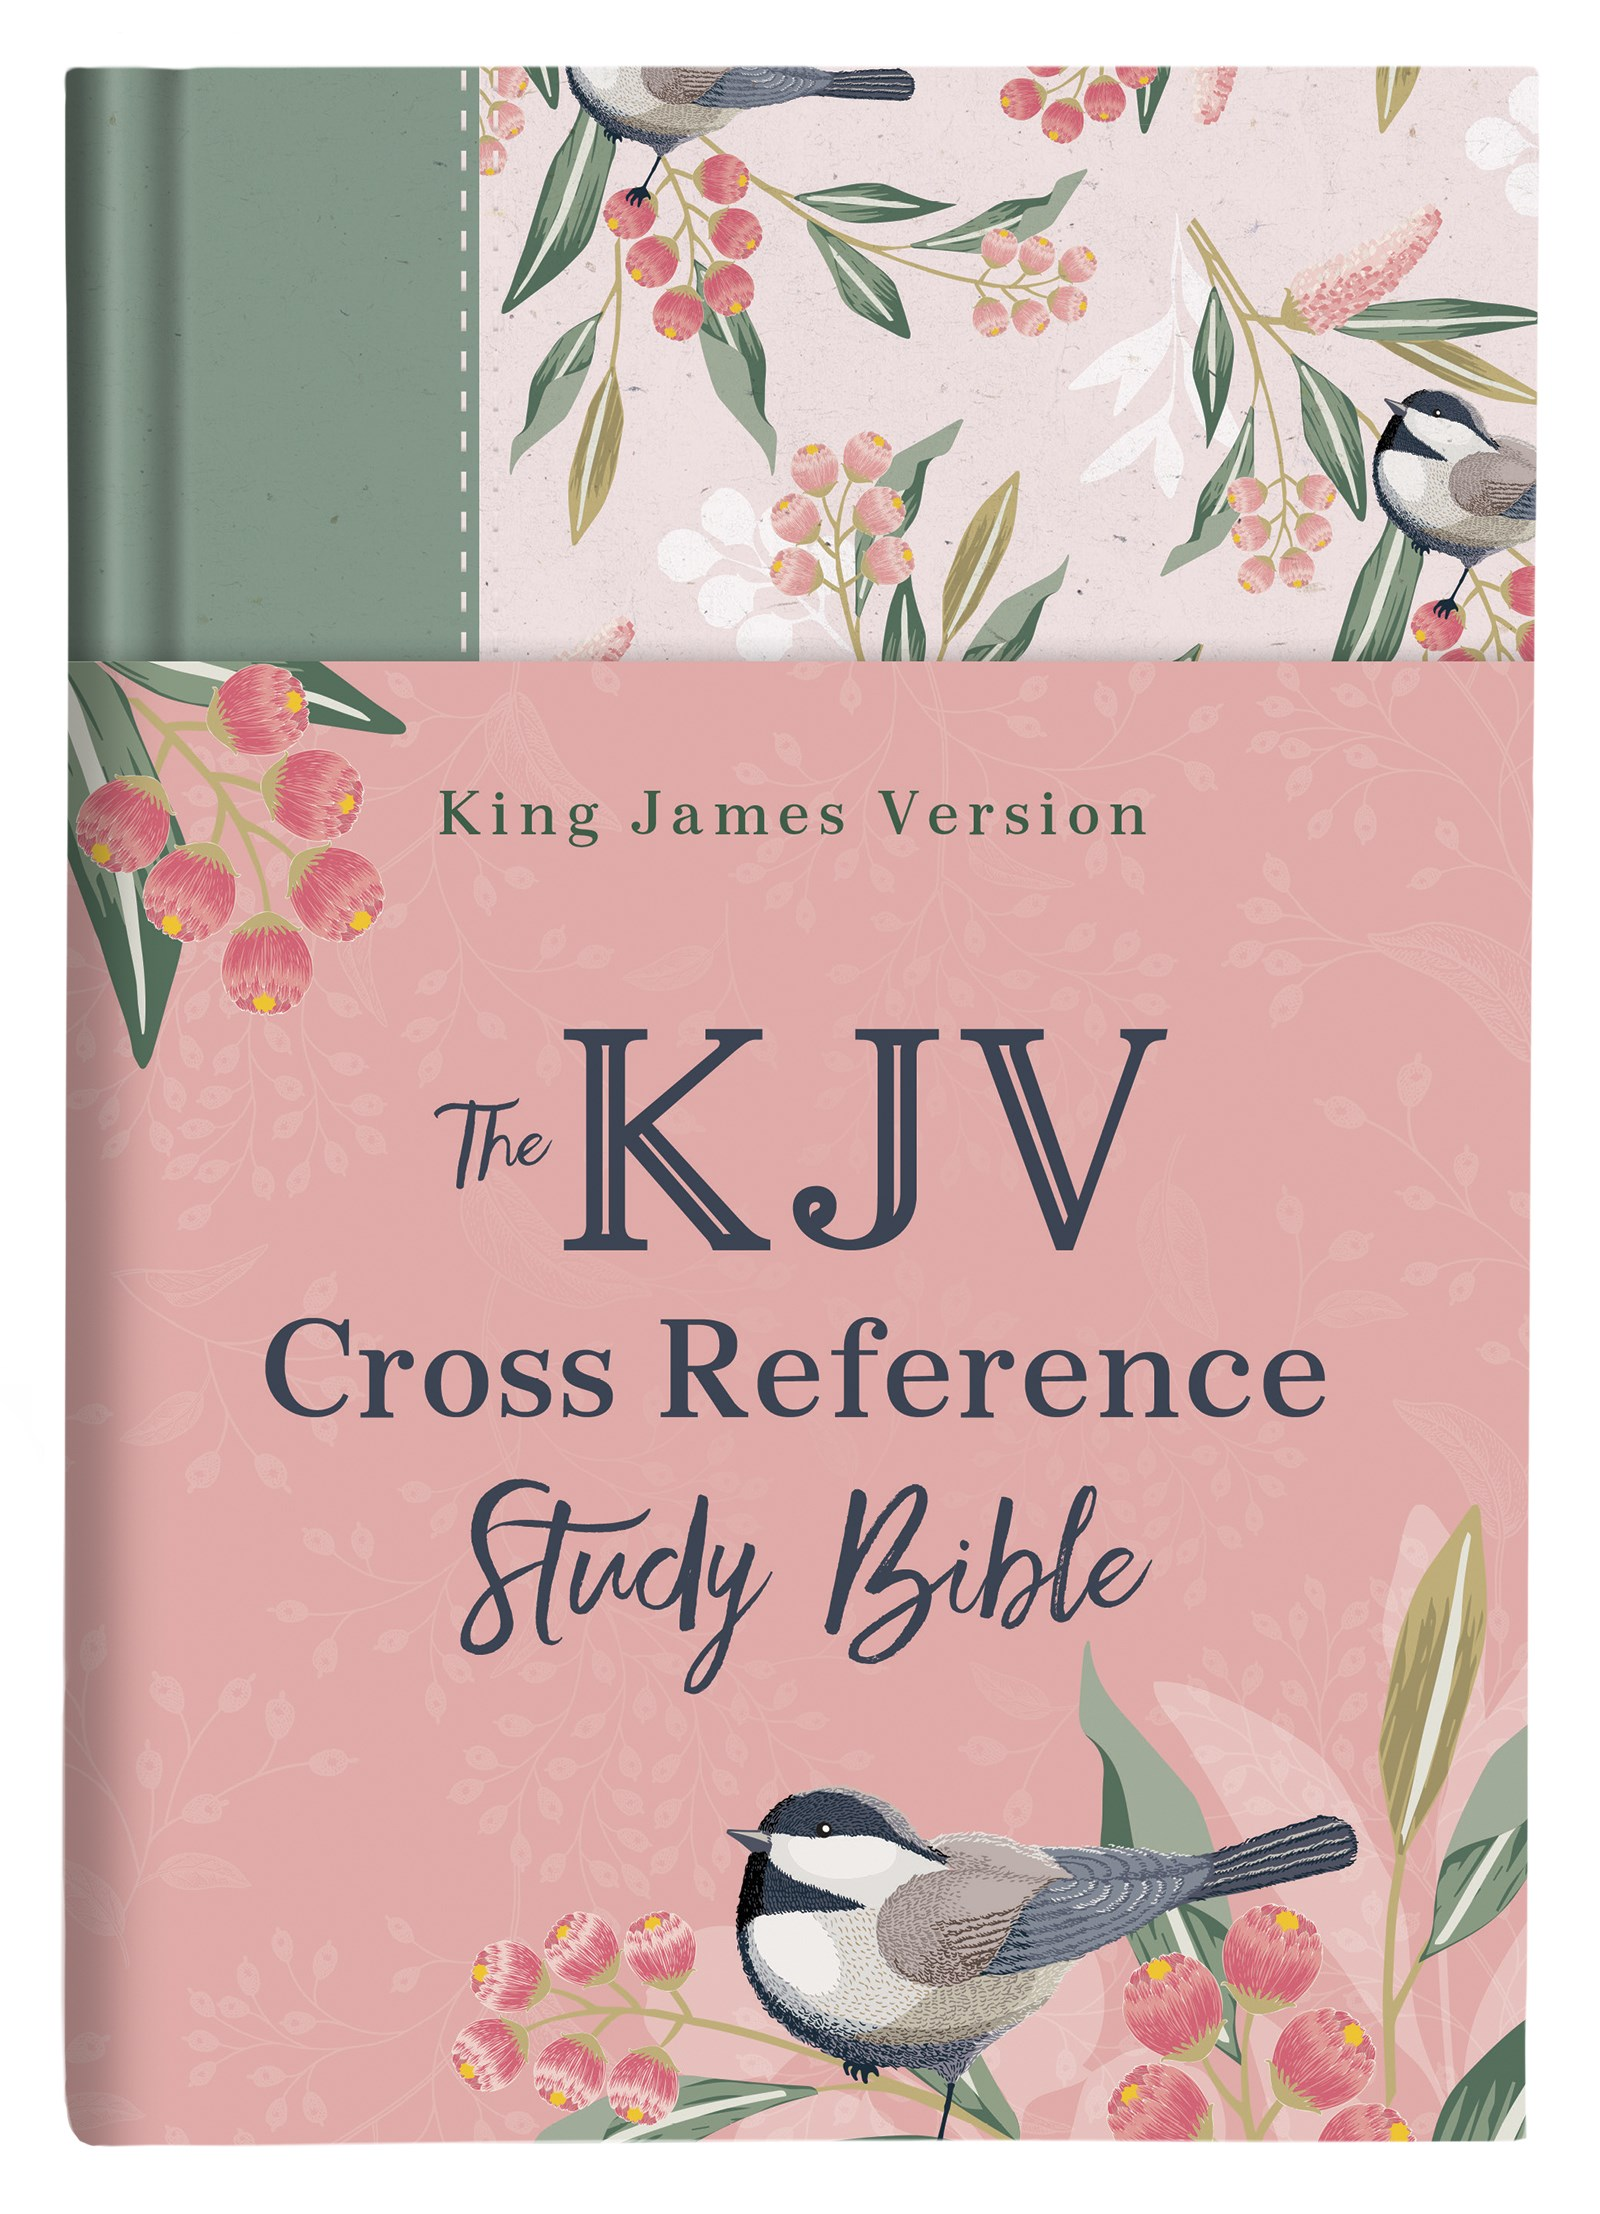 KJV Cross Reference Study Bible-Sage Songbird Hardcover